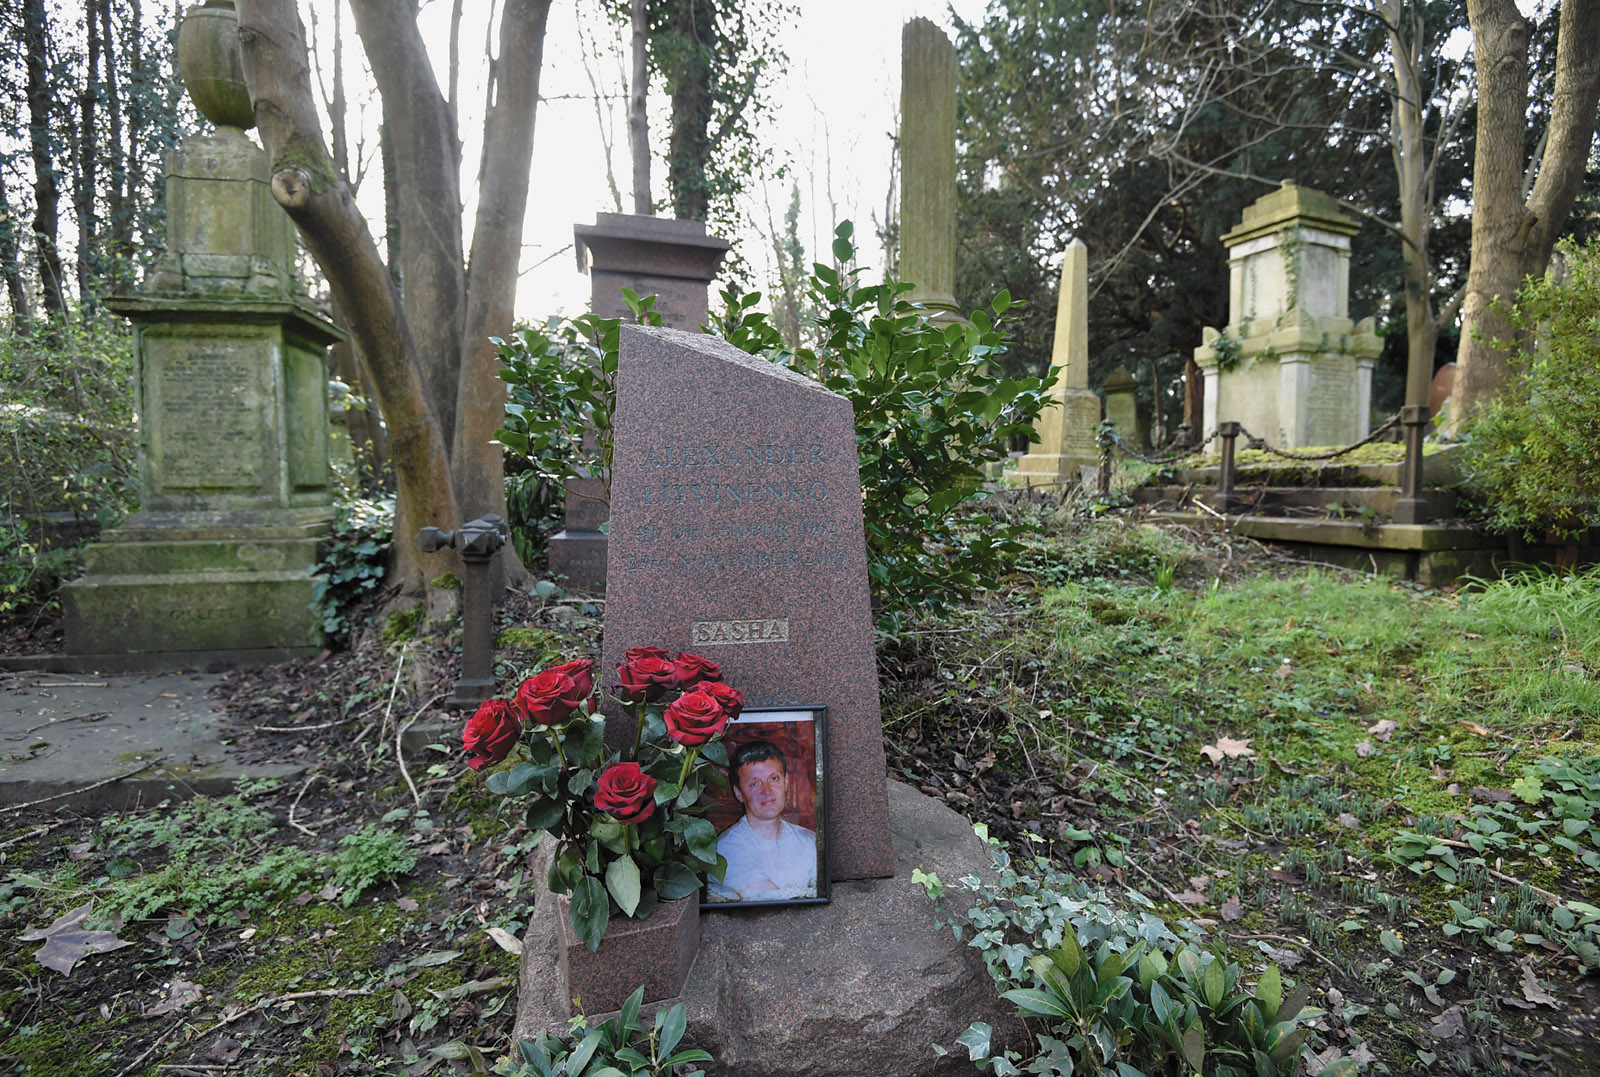 The grave of the murdered Russian ex-spy Alexander Litvinenko, Highgate Cemetery, London, 2016